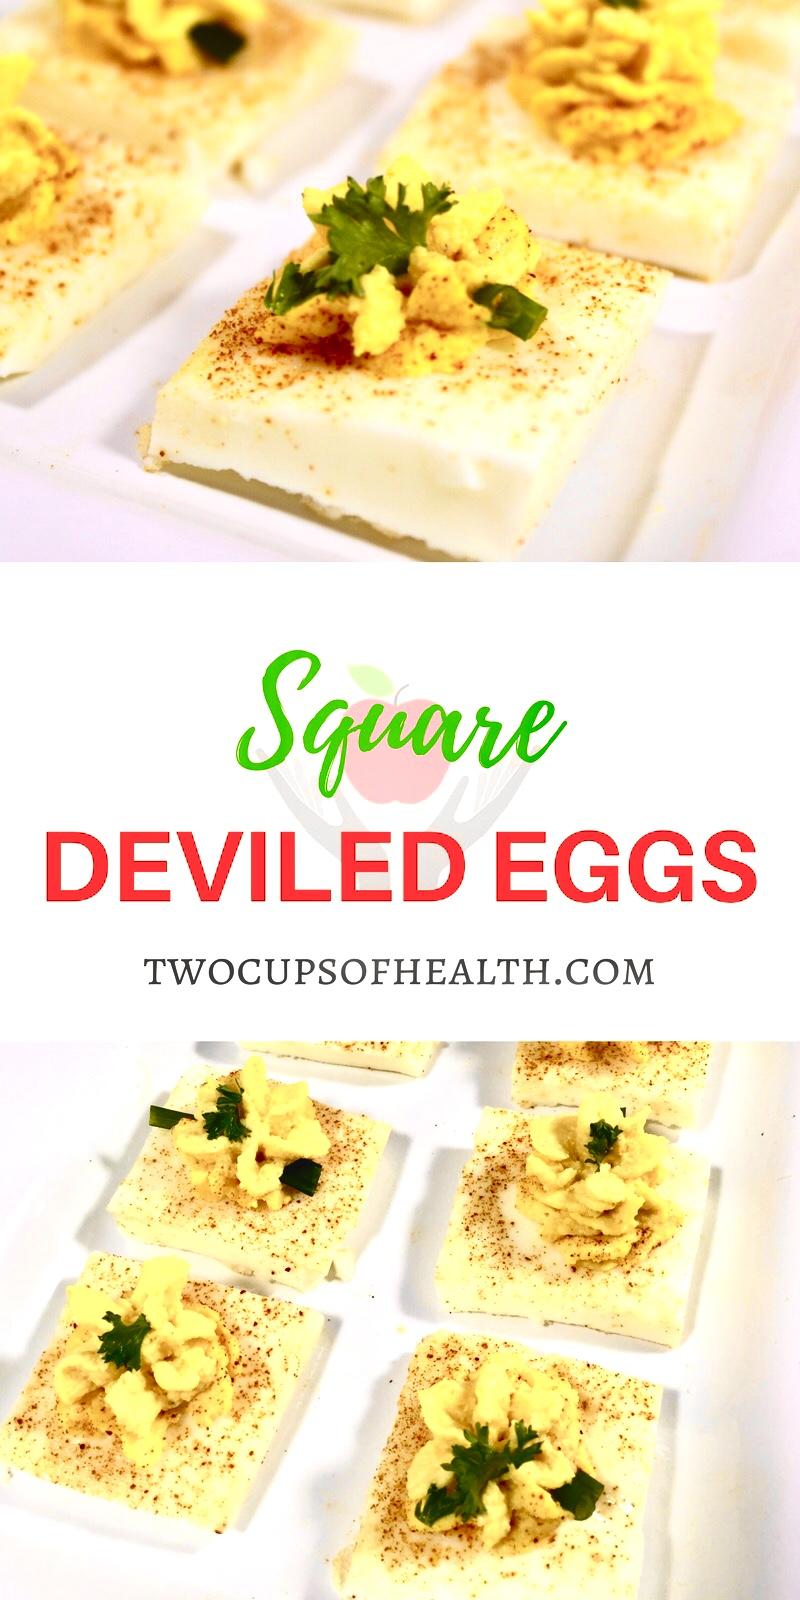 Square Deviled Eggs Pinterest Pin